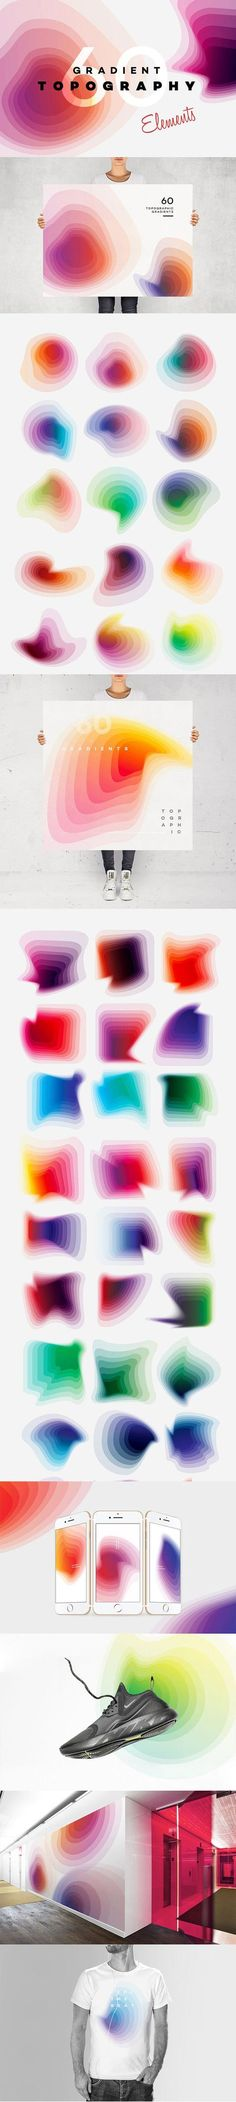 Very special design for fluids on your Layout Buch Design, Graphisches Design, Layout Design, Design Elements, Graphic Design Typography, Graphic Design Illustration, Motion Design, Packaging Design, Branding Design